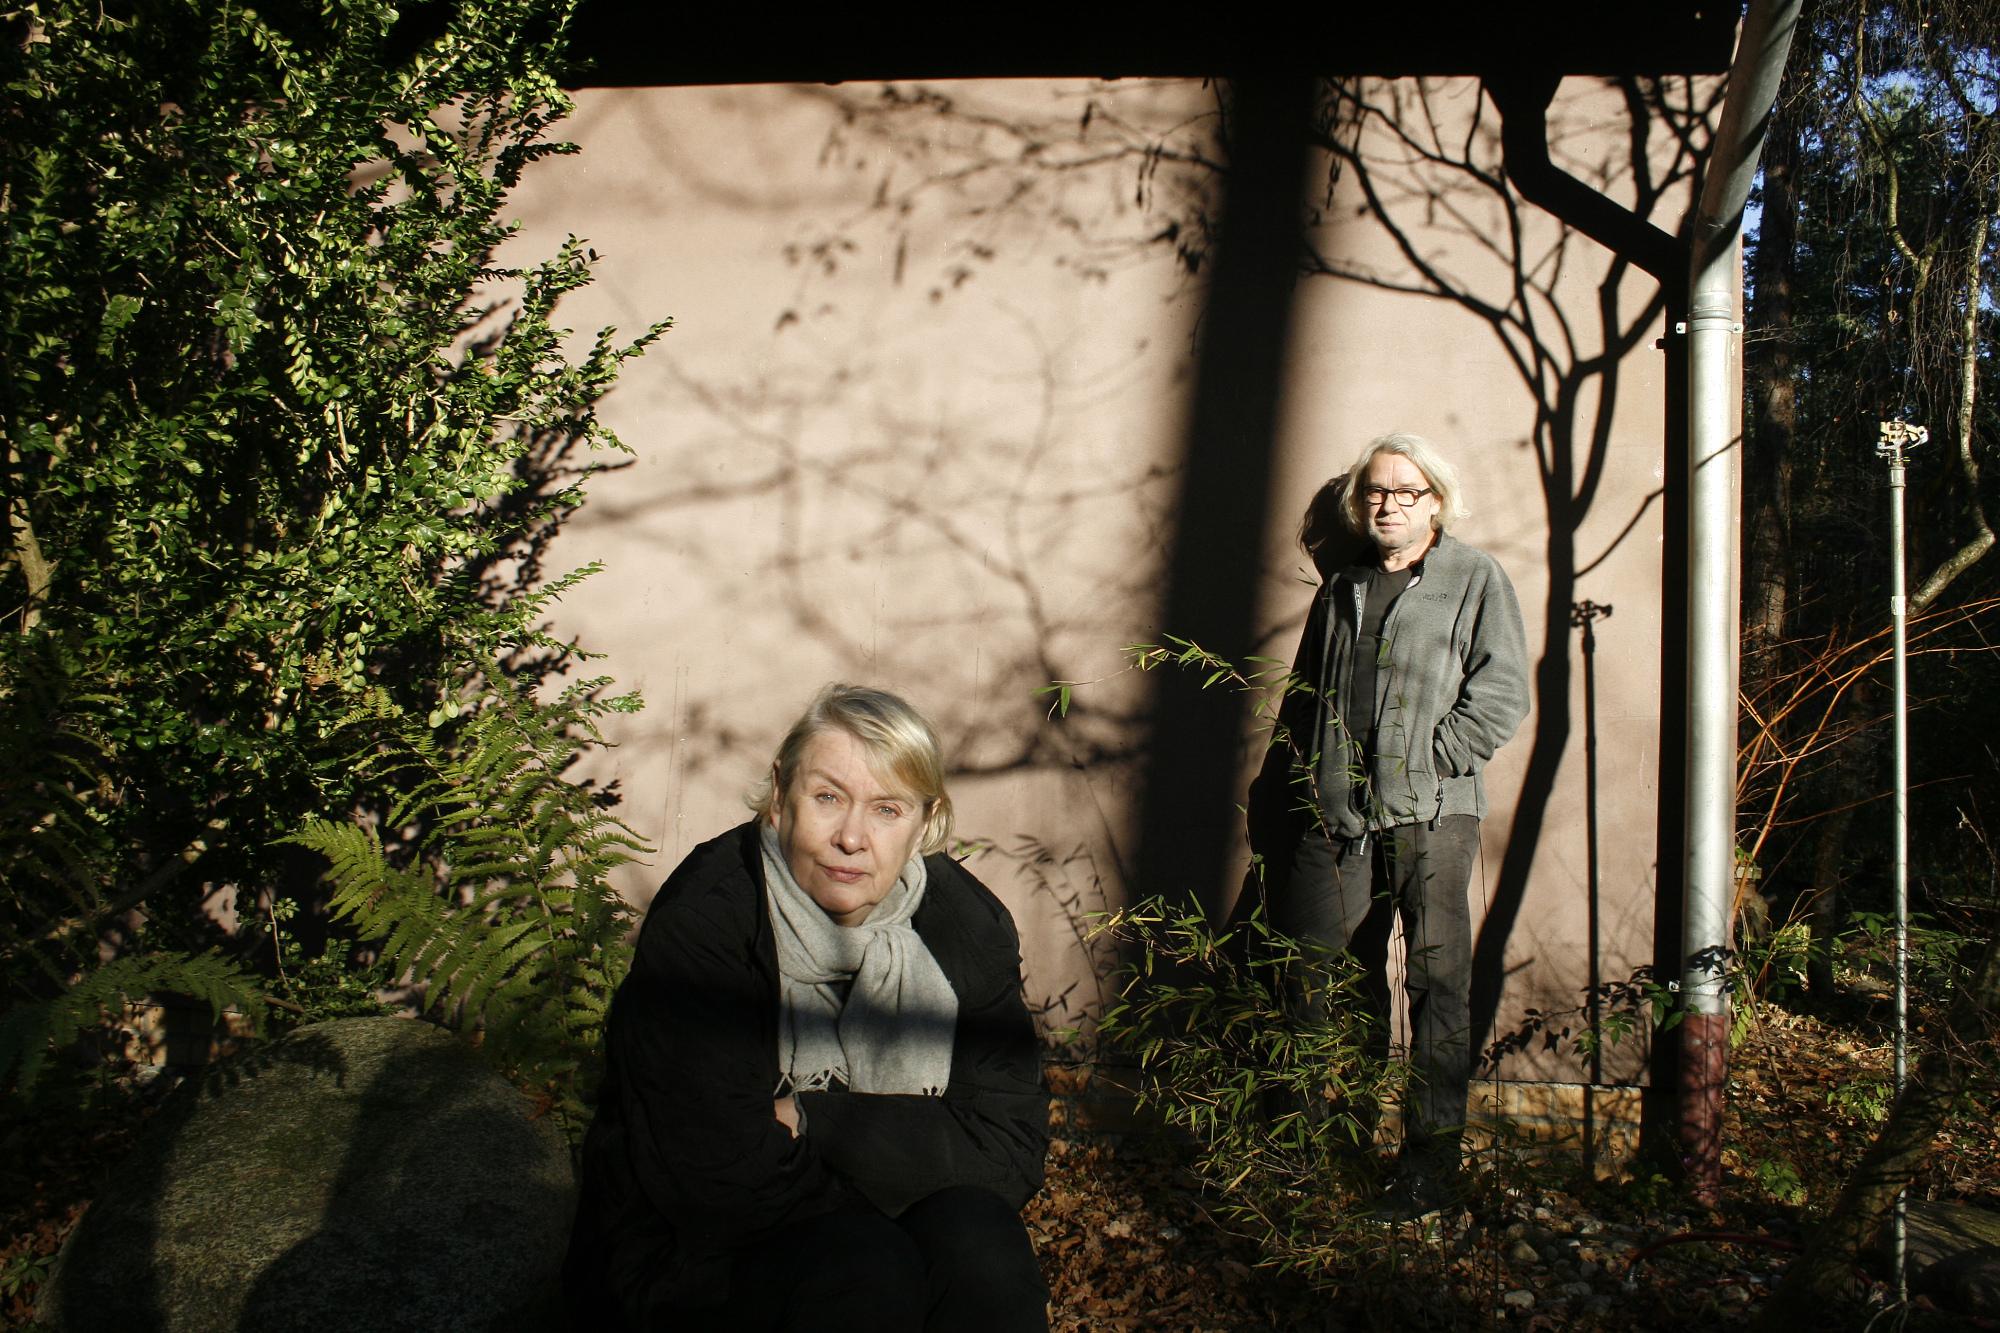 Ute Mahler und Werner Mahler Lehnitz, November 2013 © Ingo Taubhorn